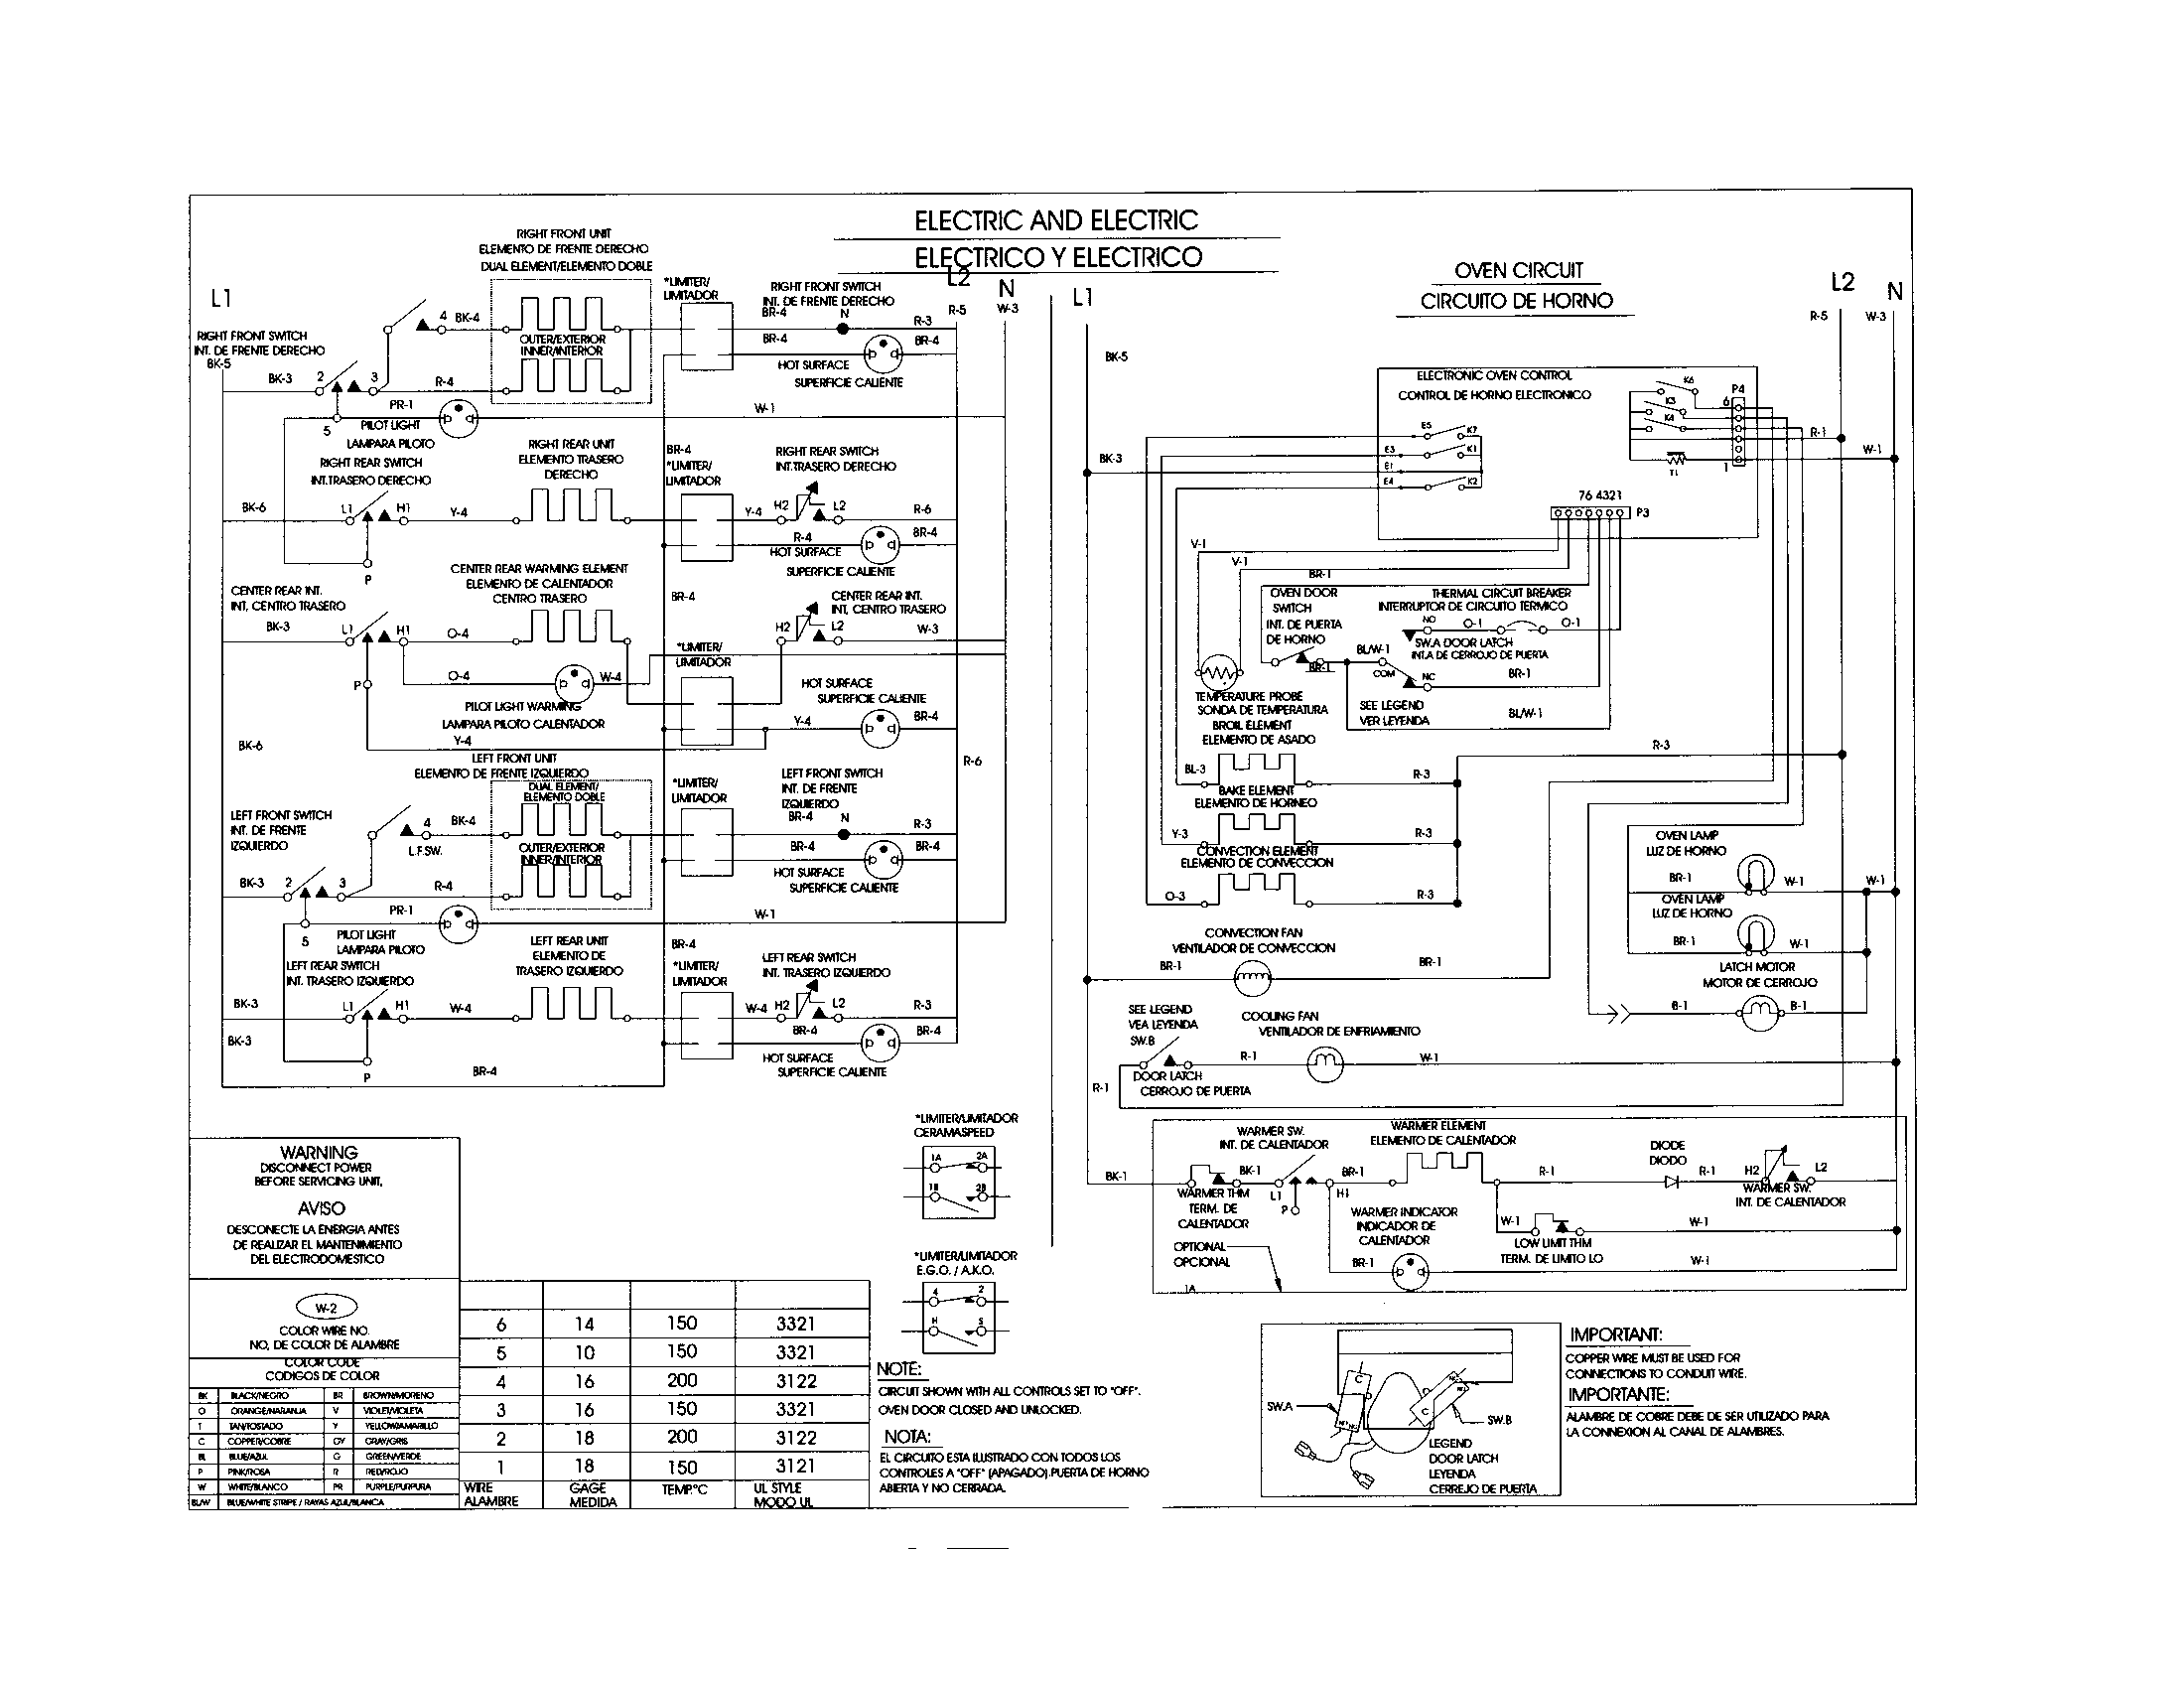 Sears Dishwasher Wiring Diagram -Cat6 568b Jack Wiring | Begeboy Wiring  Diagram Source | Ge Wiring Diagram For Dishwasher |  | Begeboy Wiring Diagram Source